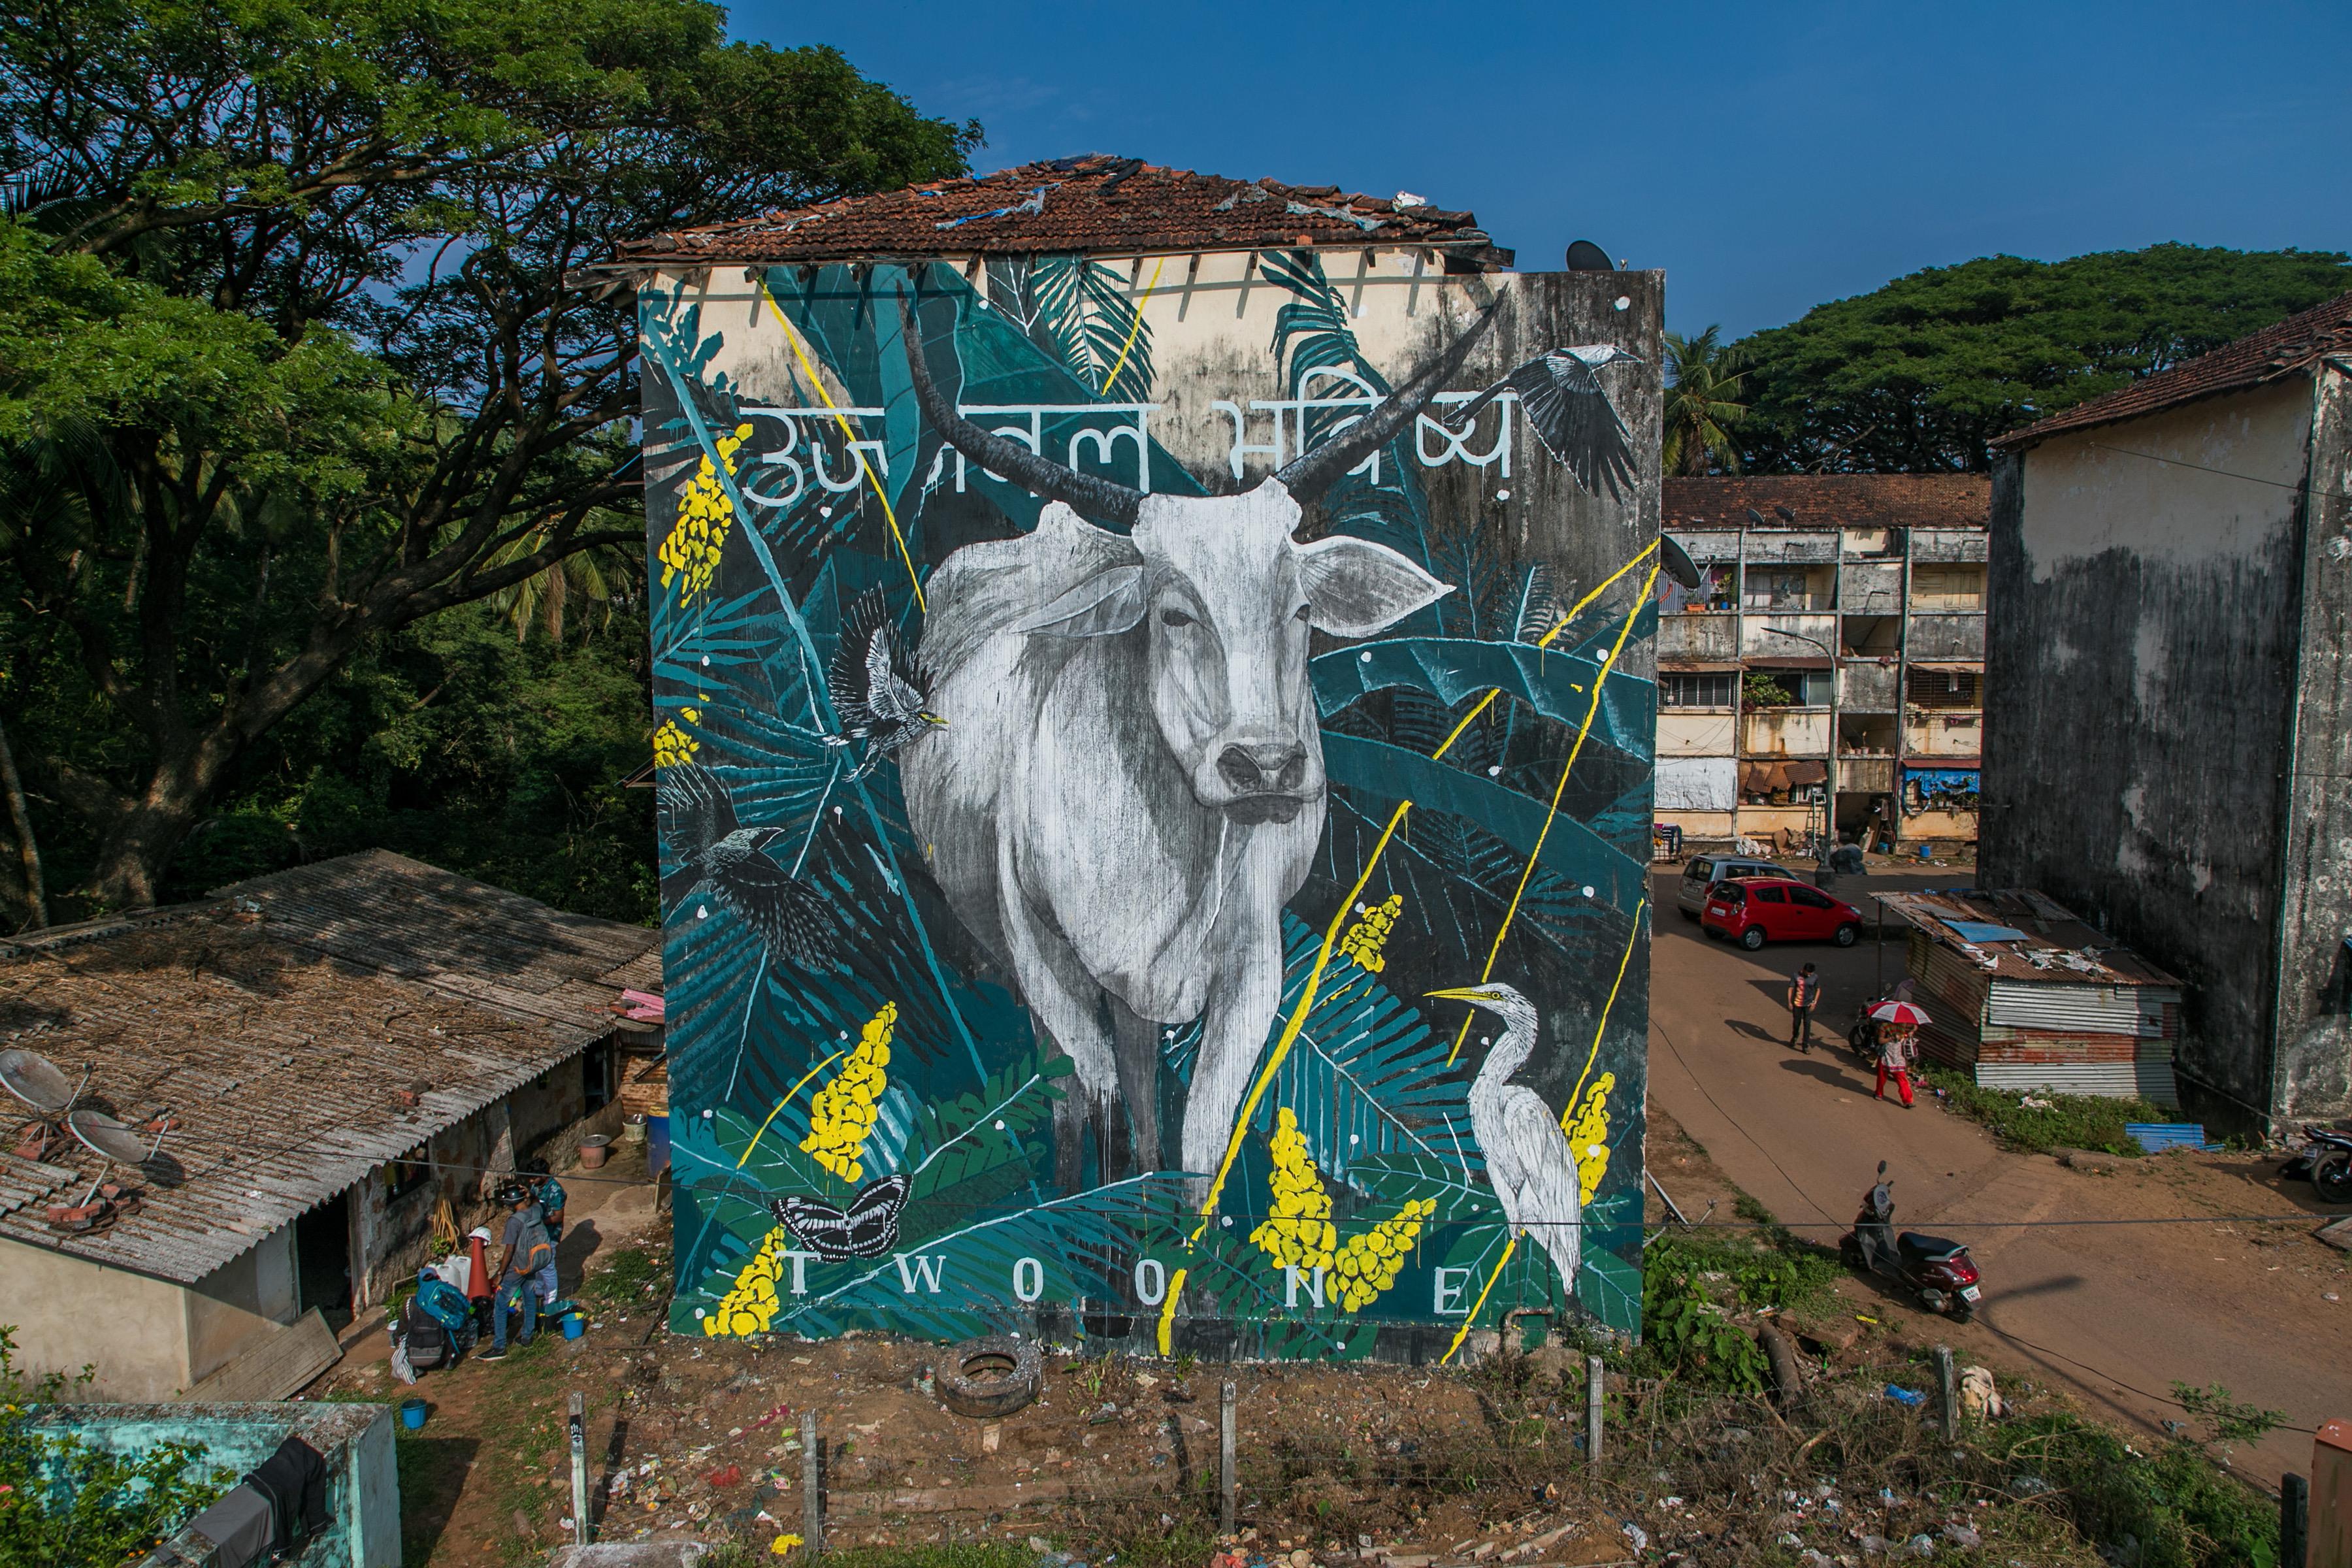 Twoone Reveals St Art Goa 2019 Pranav Gohil 5